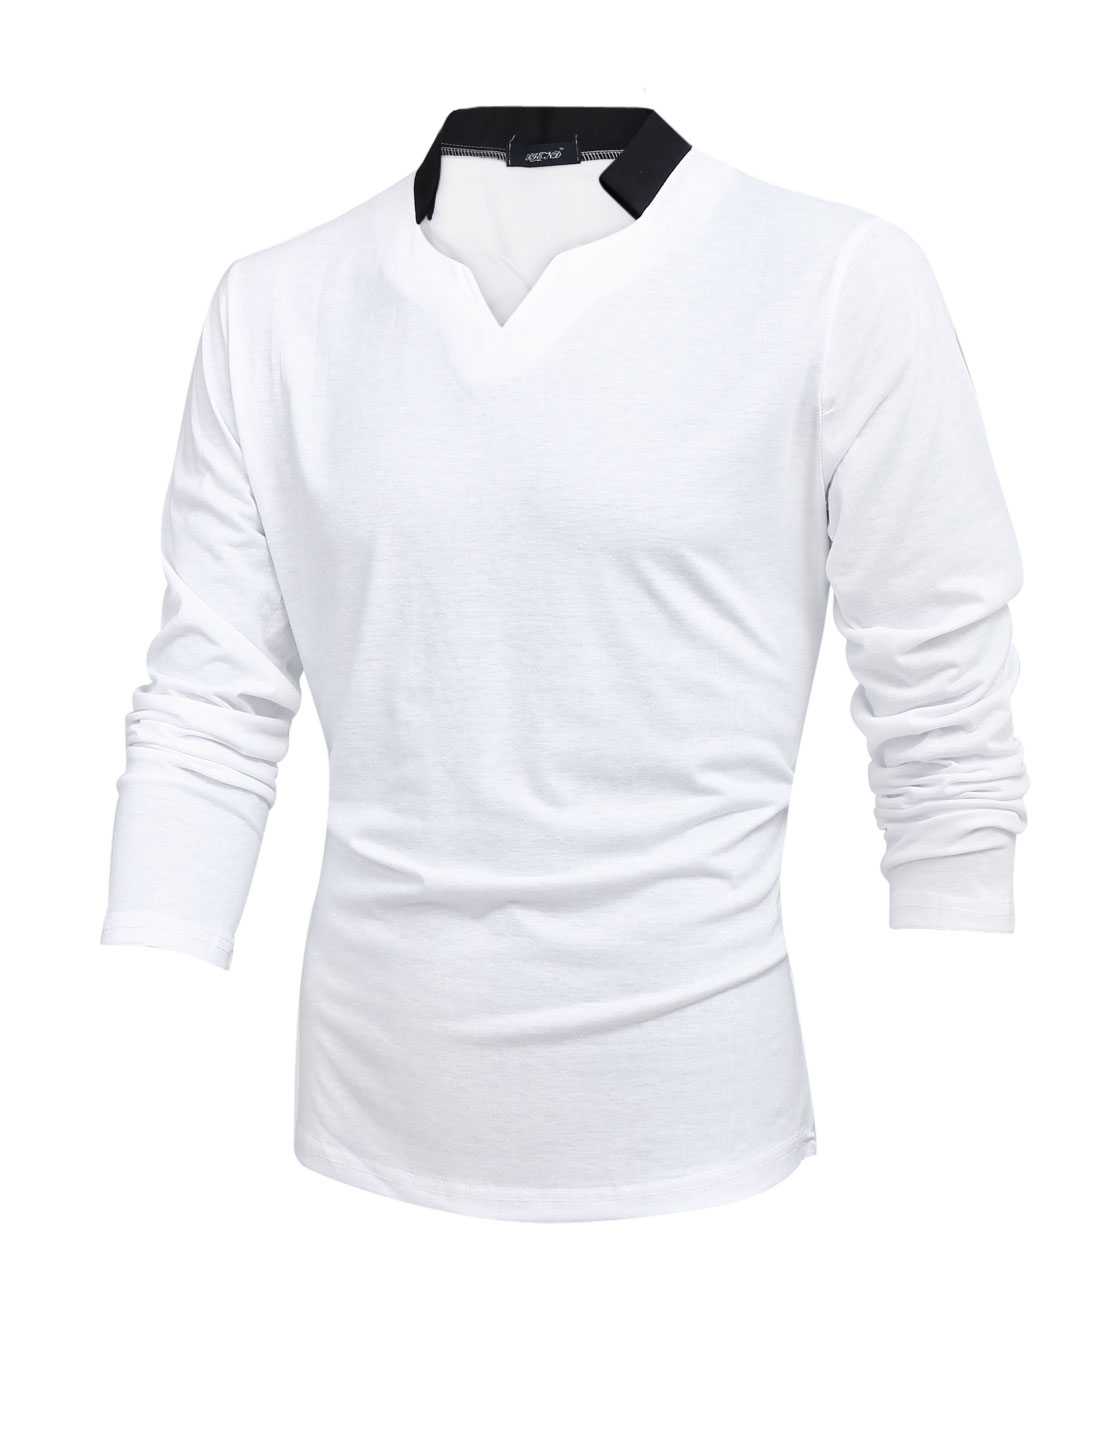 Men Long Sleeve Color Block Split Neck Leisure T-shirt White M